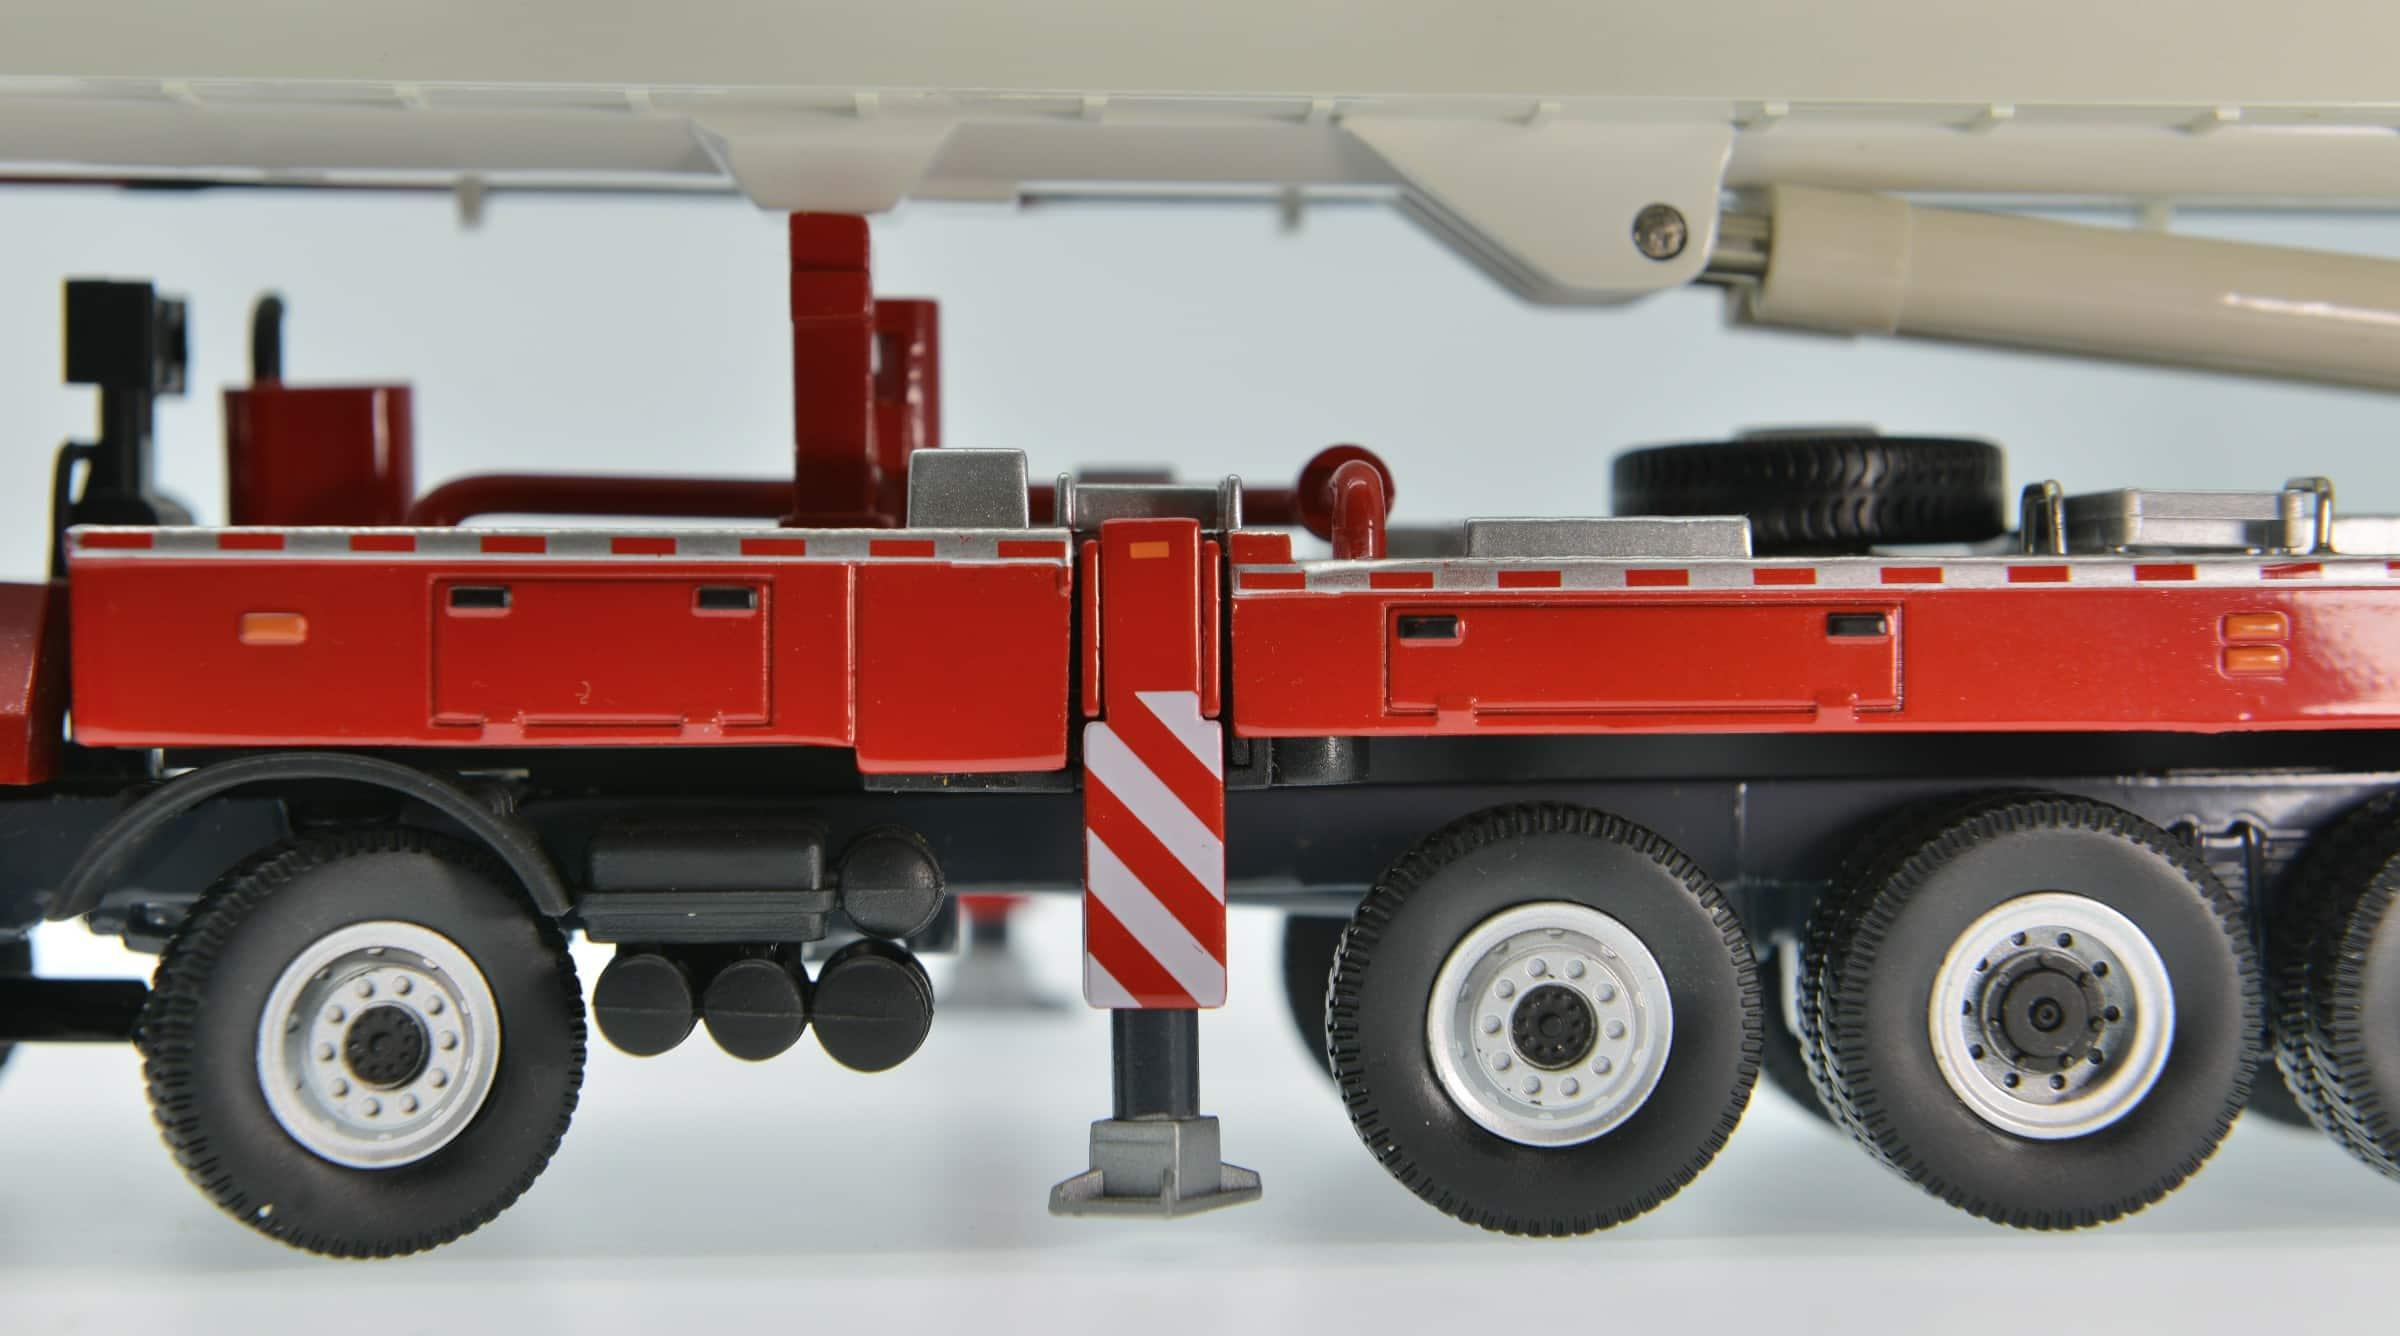 XCMG Fire Truck DG100 Model (1:50)